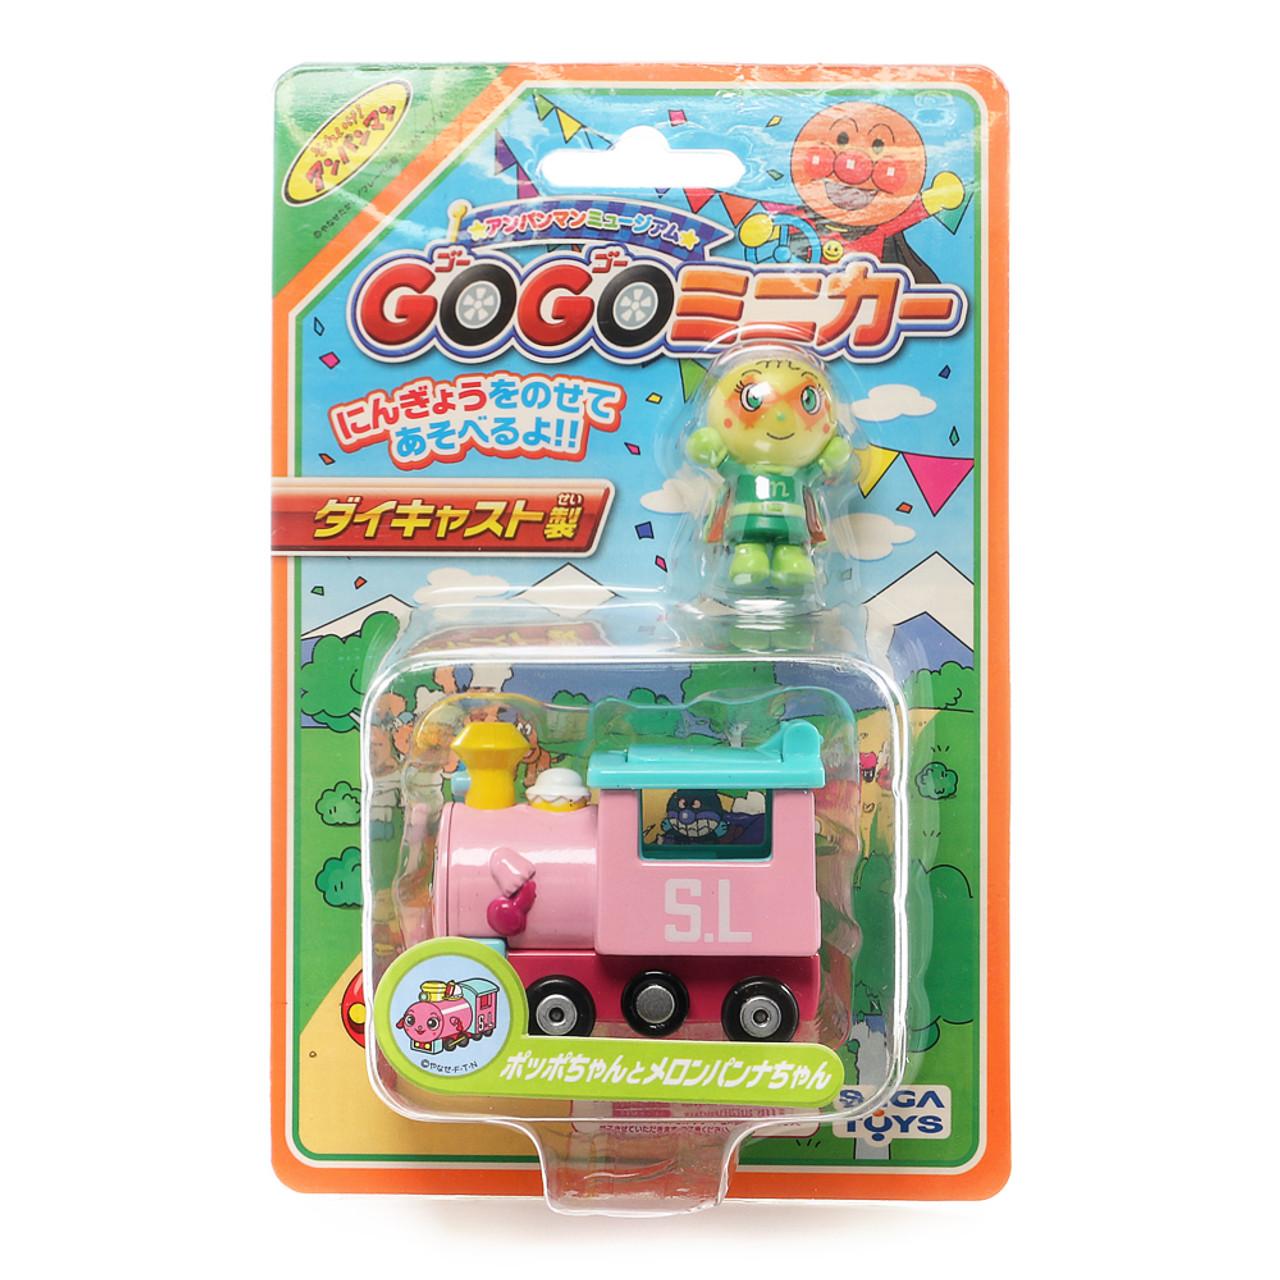 Sega Toys Anpanman Museum Go Go Mini Vehicle Carry Hero - Melonpanna Poppo train ( Complete Packing )